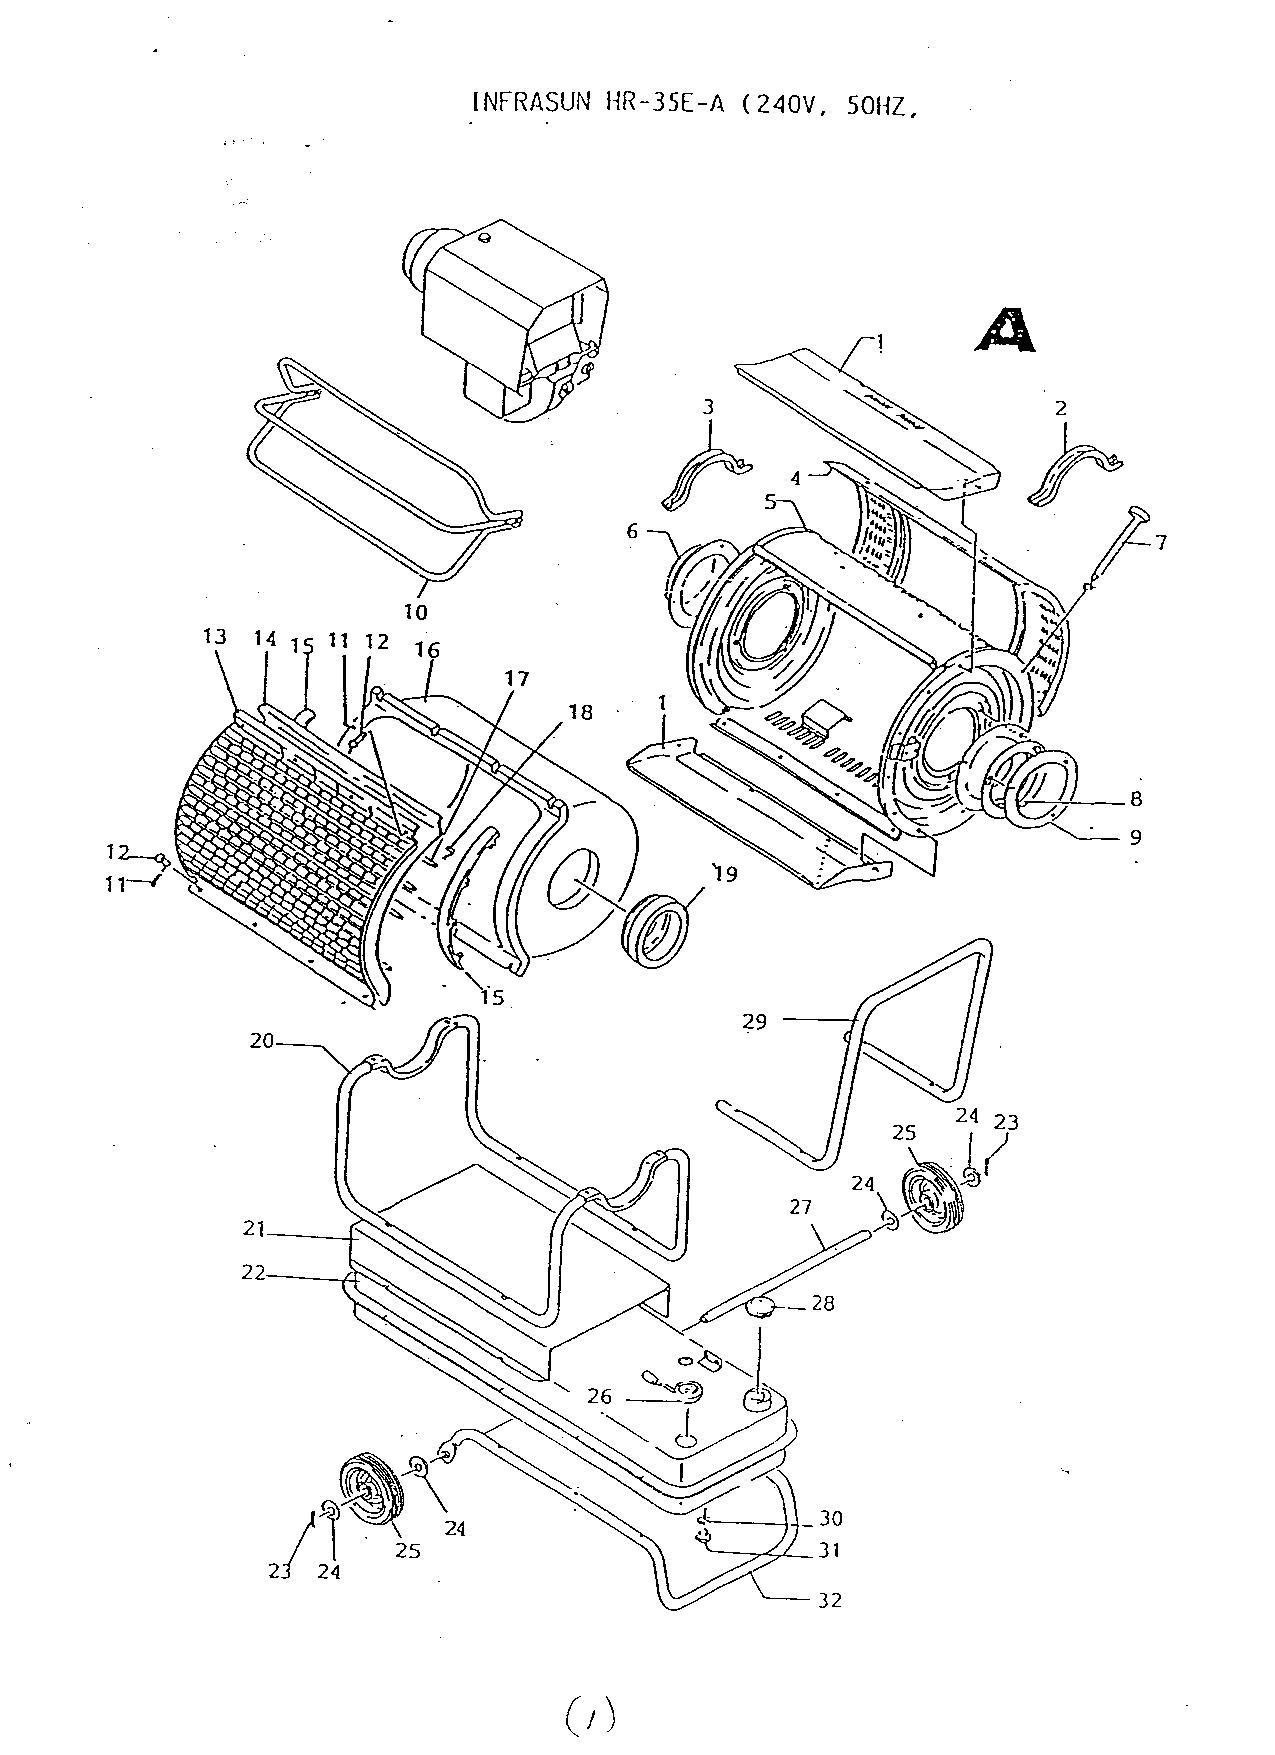 radiant gas heater wiring diagram